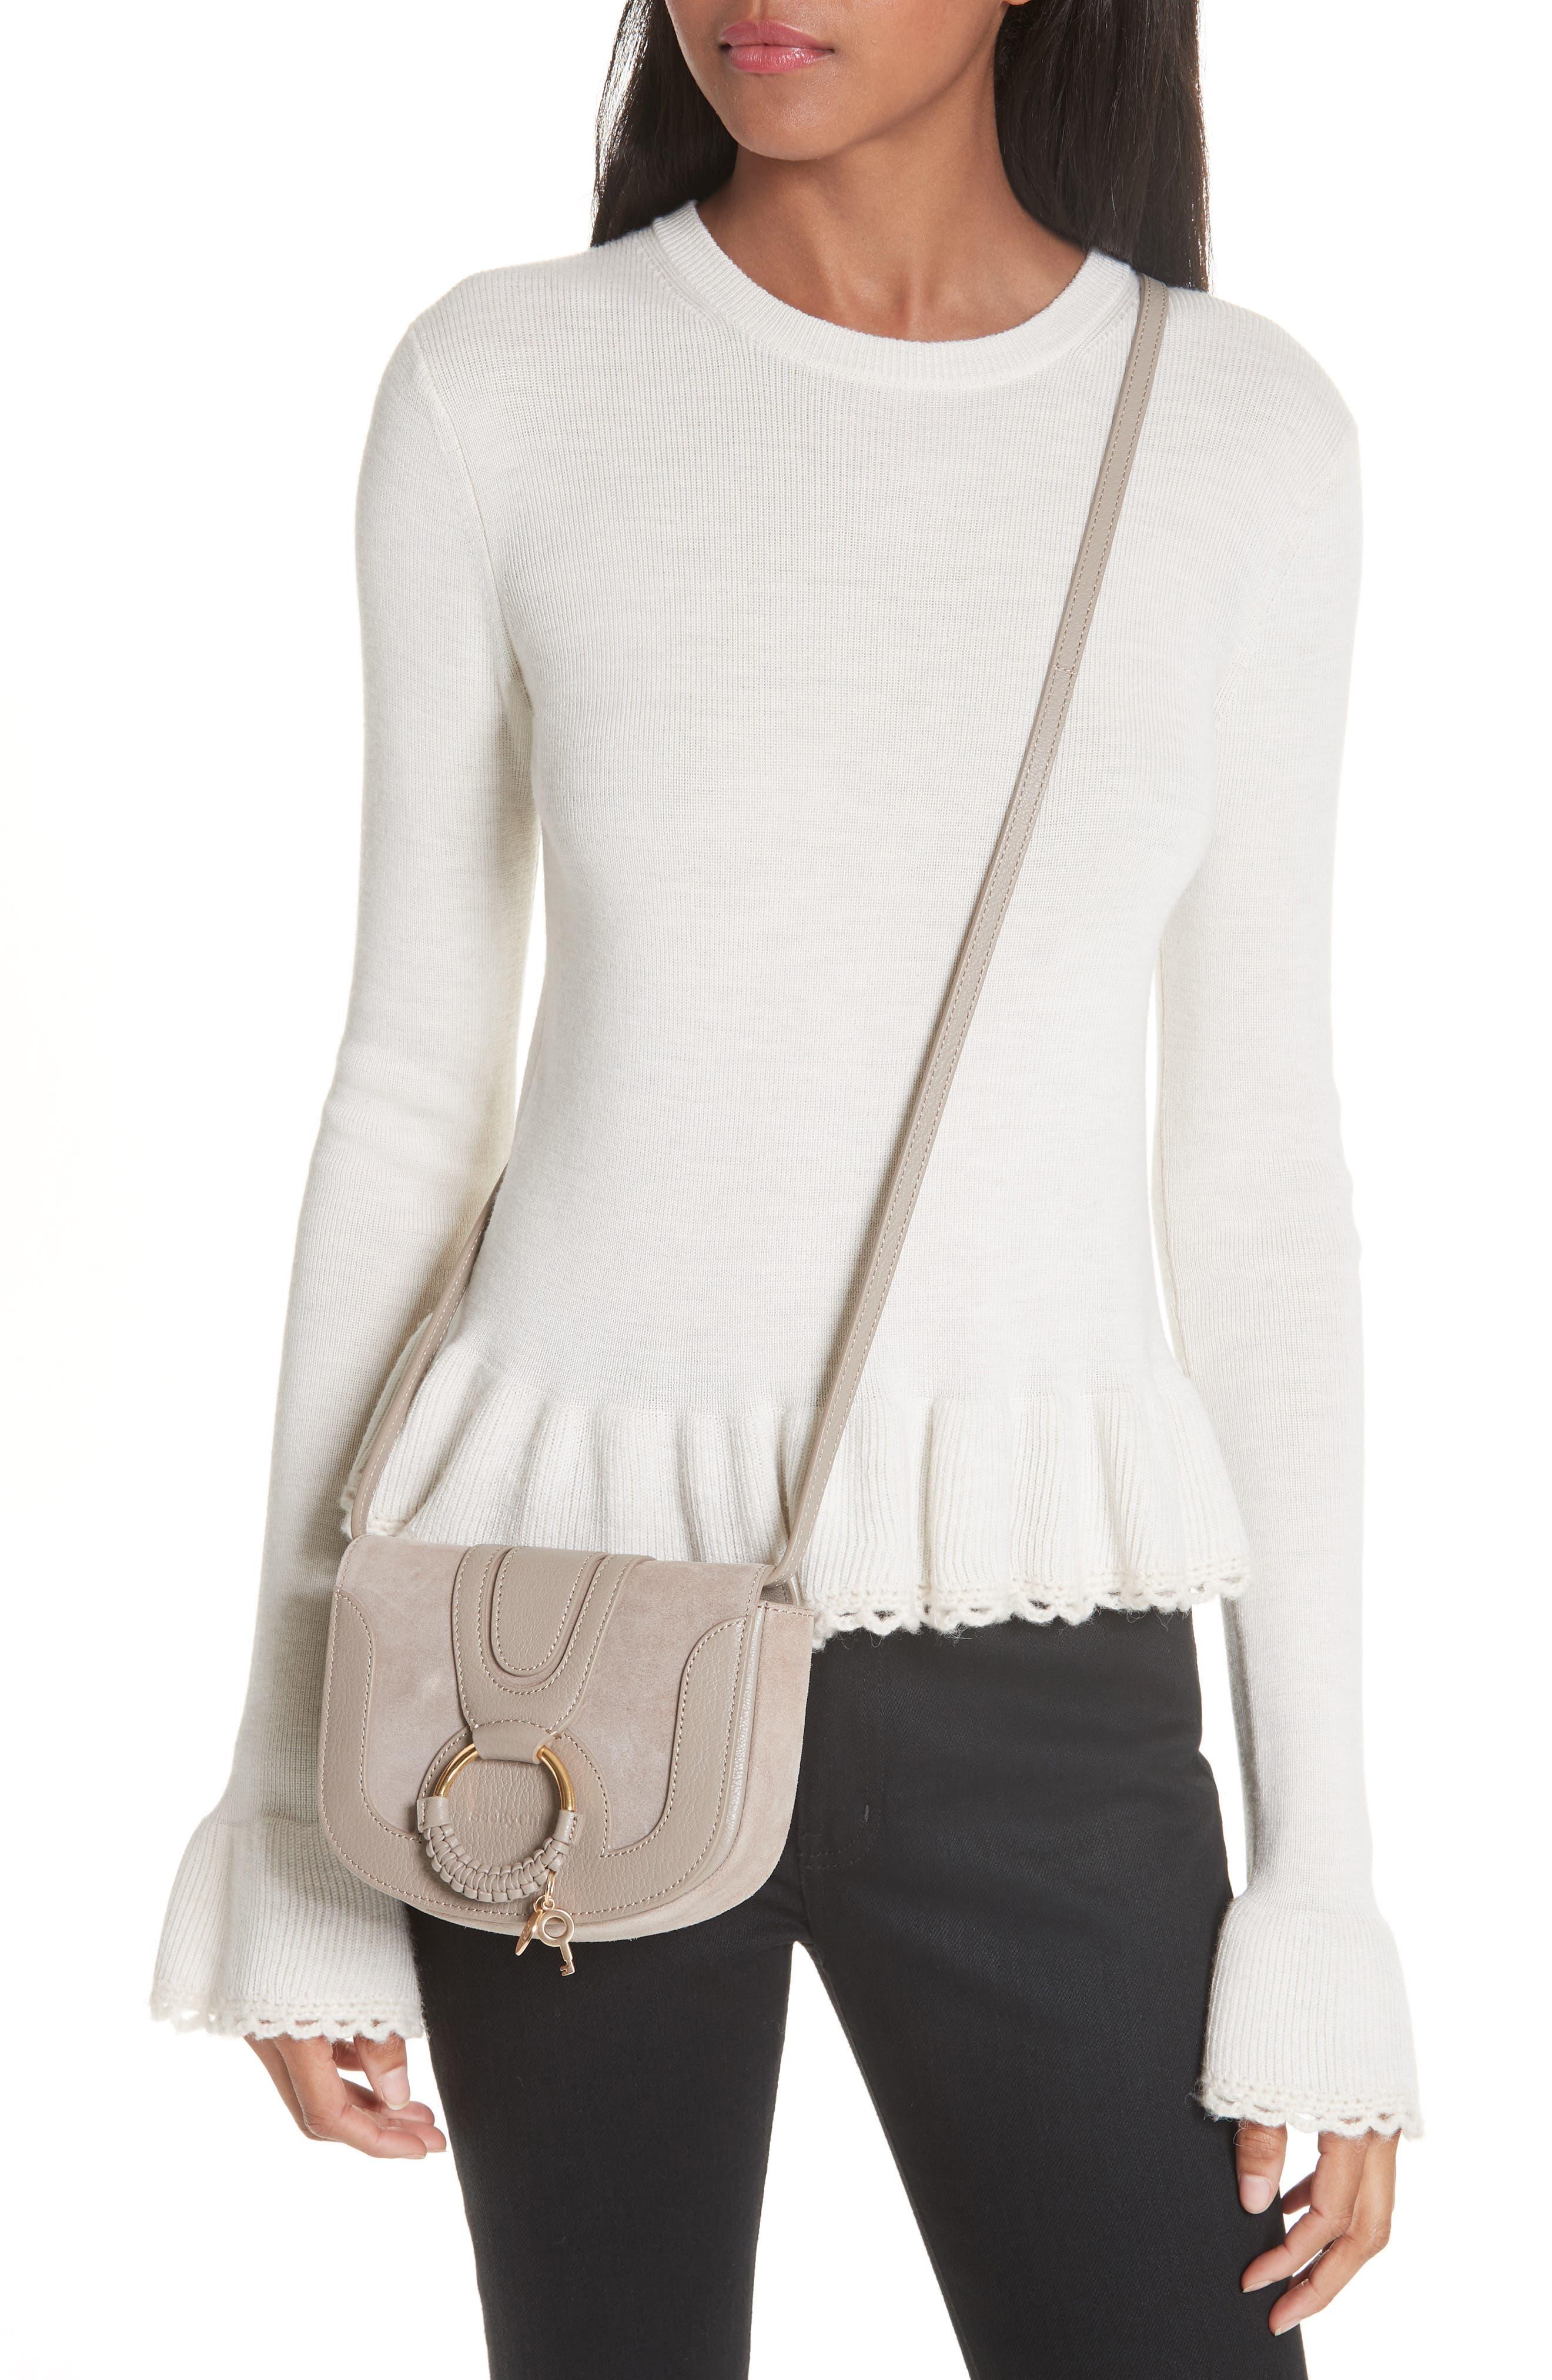 Hana Small Leather Crossbody Bag,                             Alternate thumbnail 10, color,